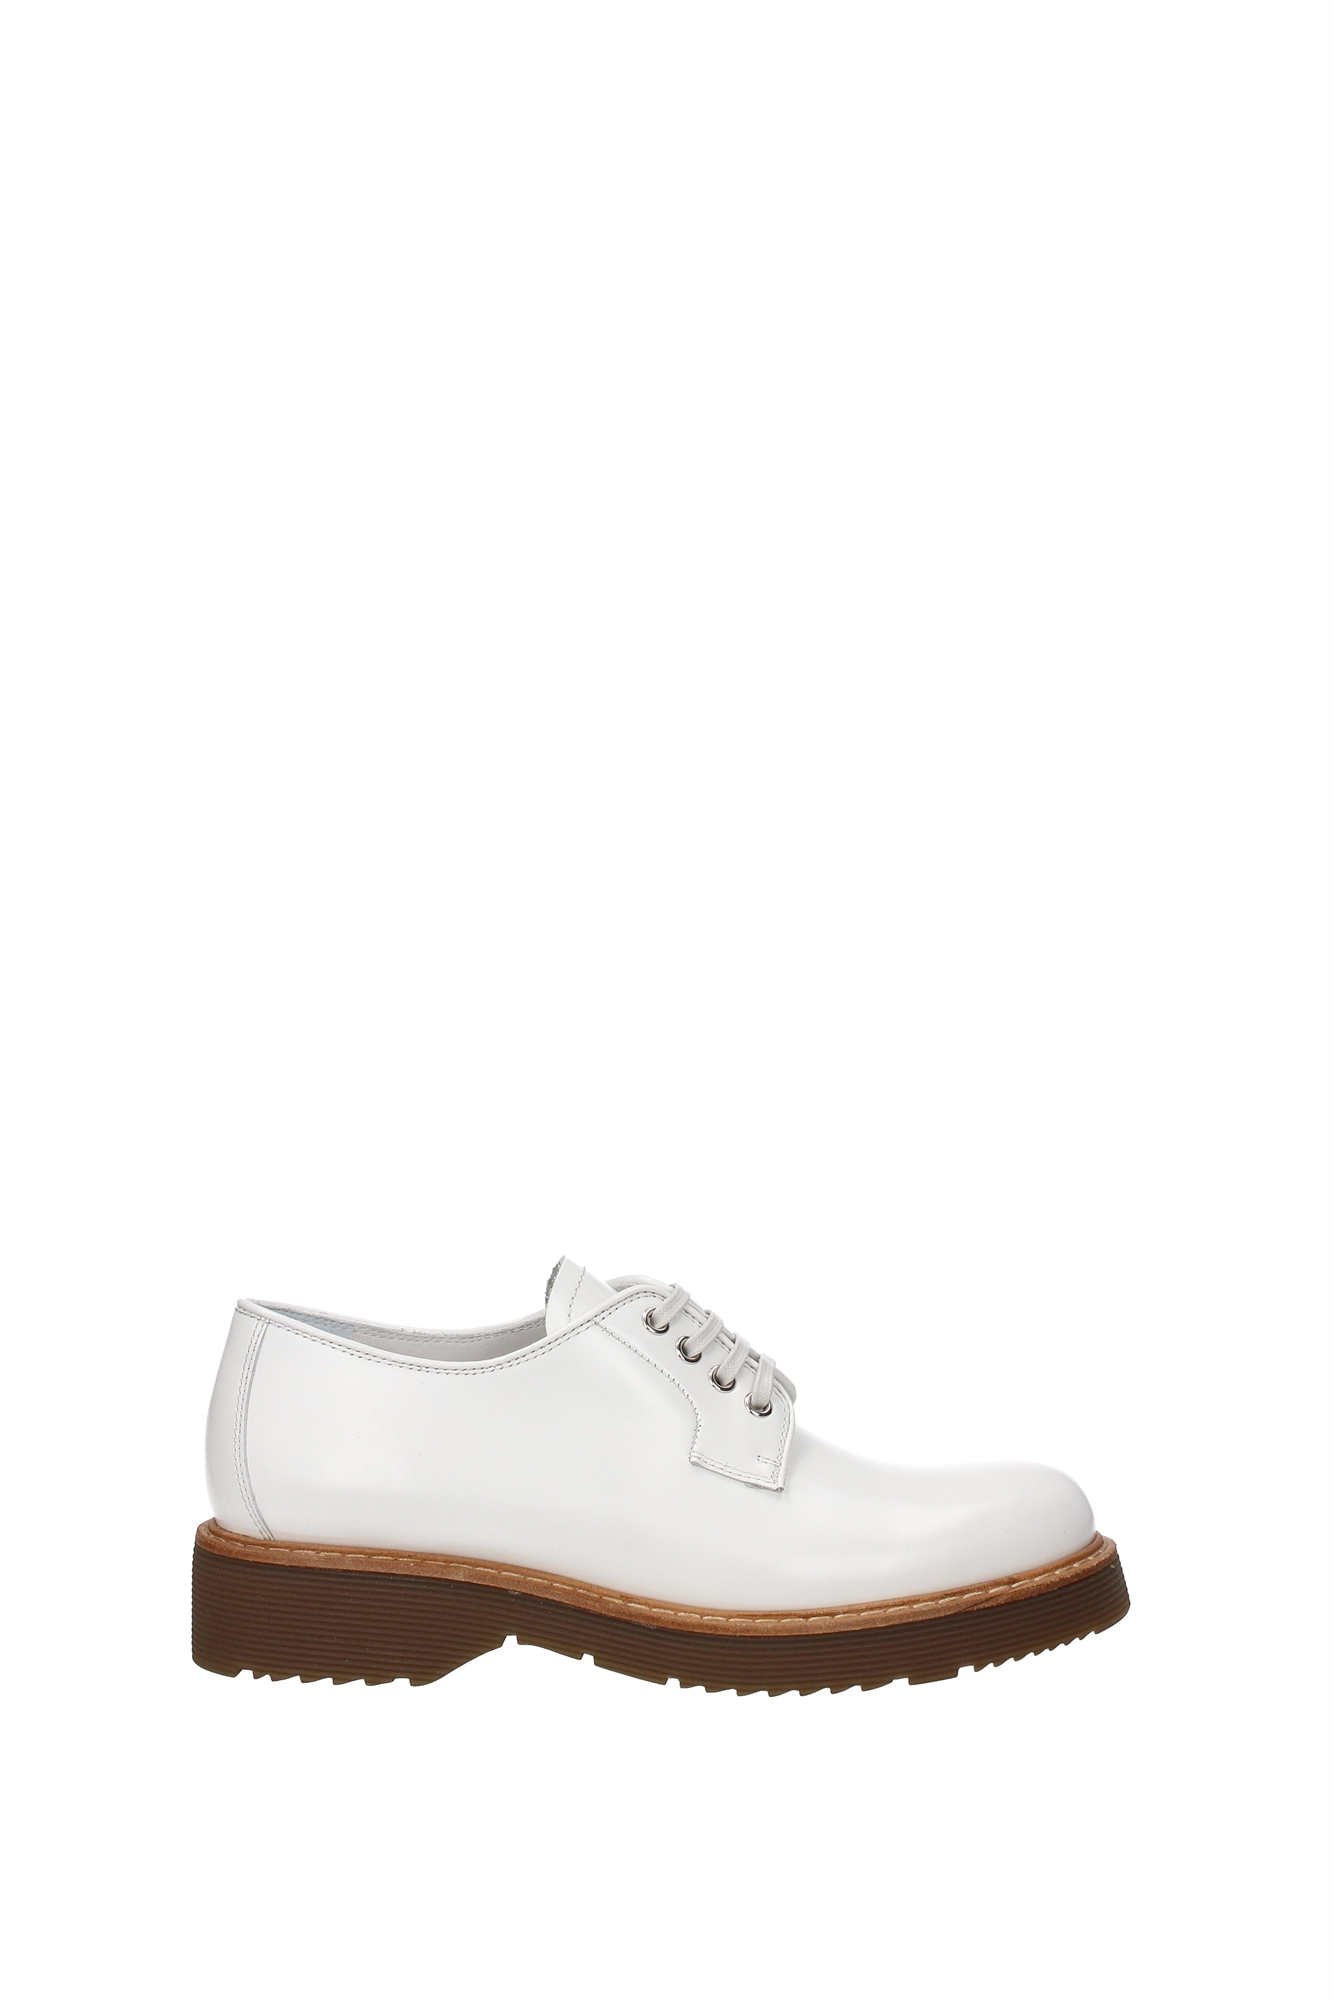 lace up shoes prada leather white 3e5879talco ebay